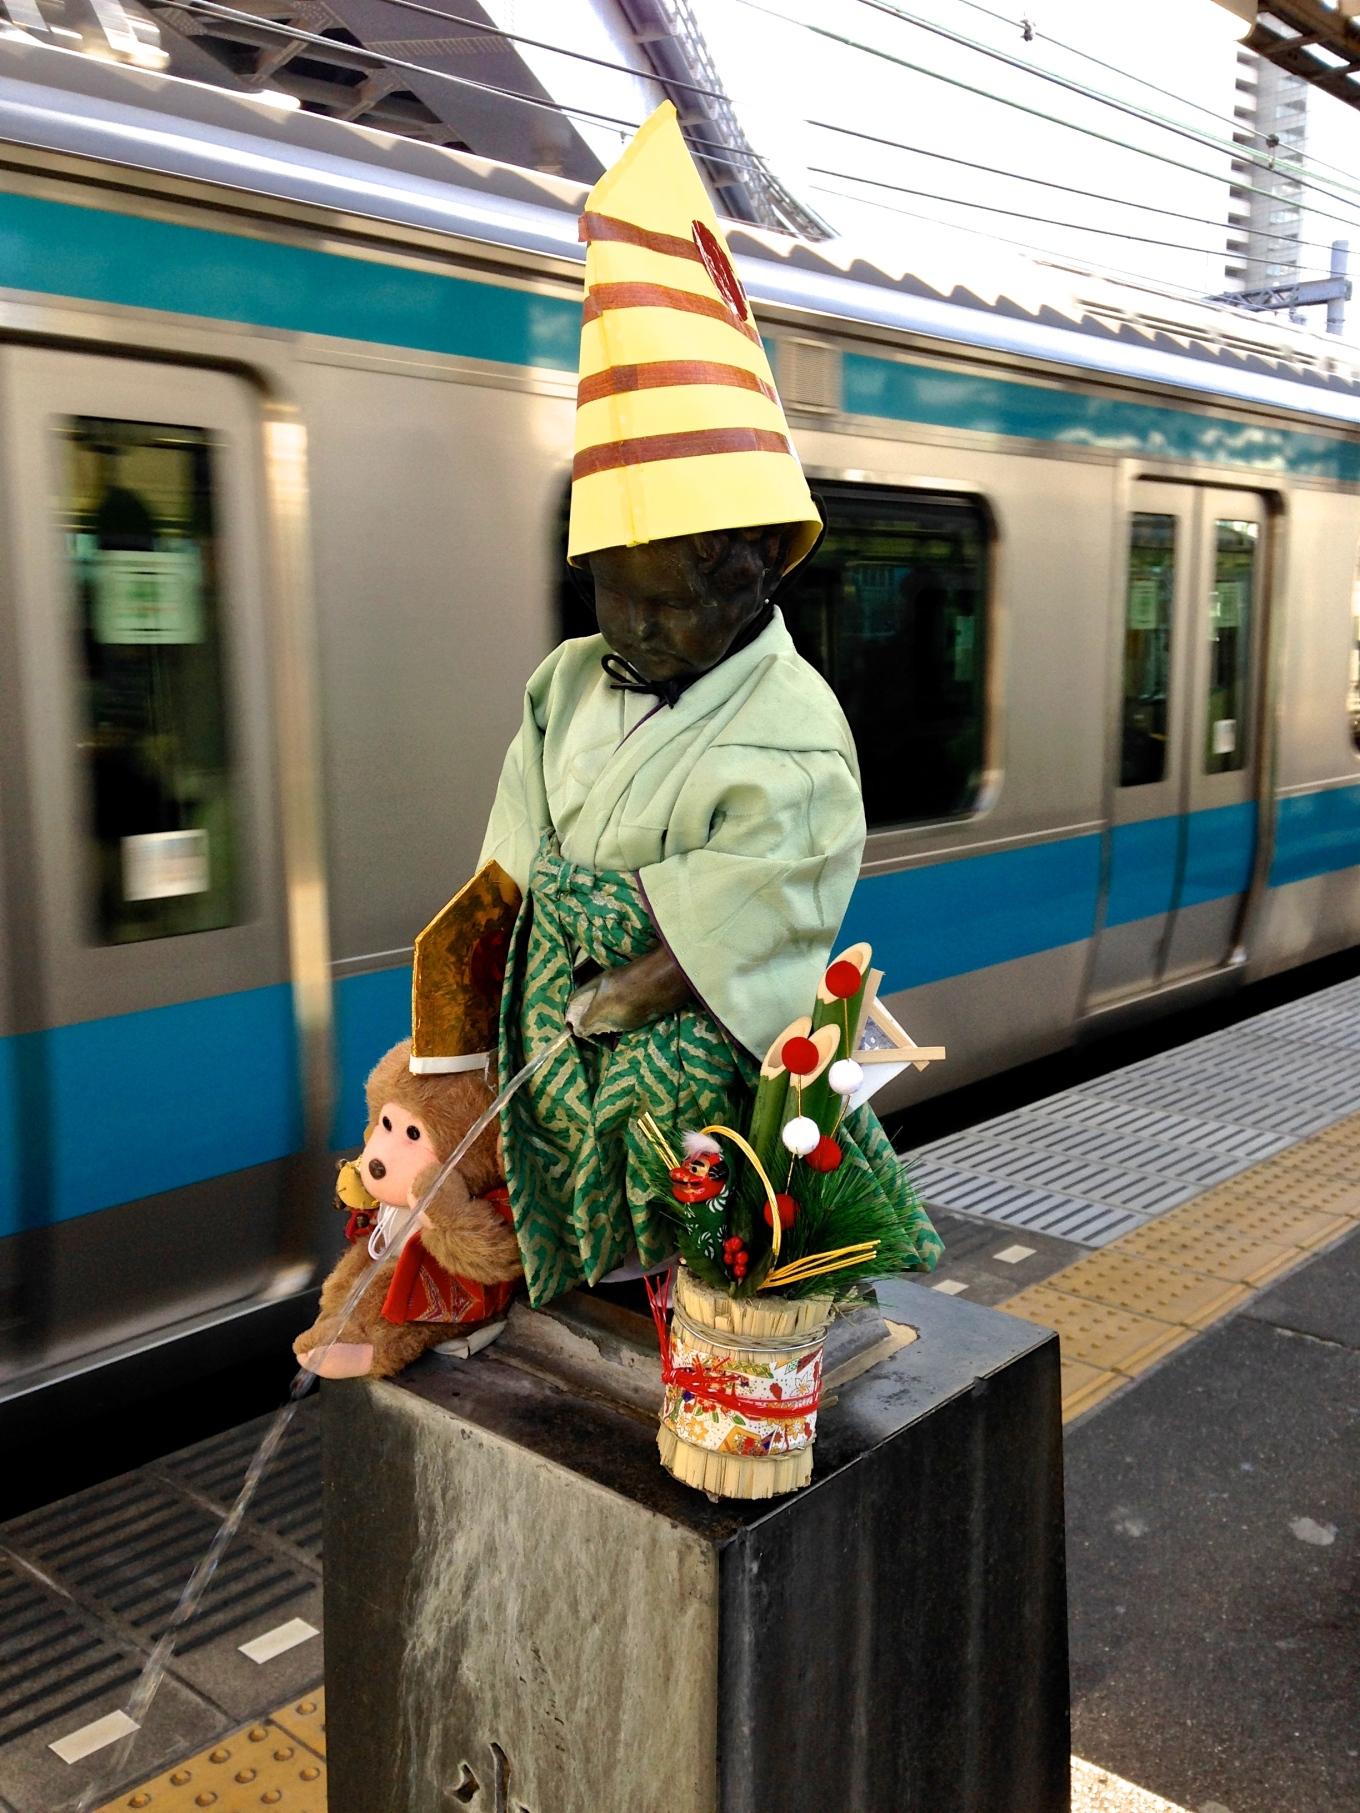 January 2016: Samurai ushering in the Year of the Monkey